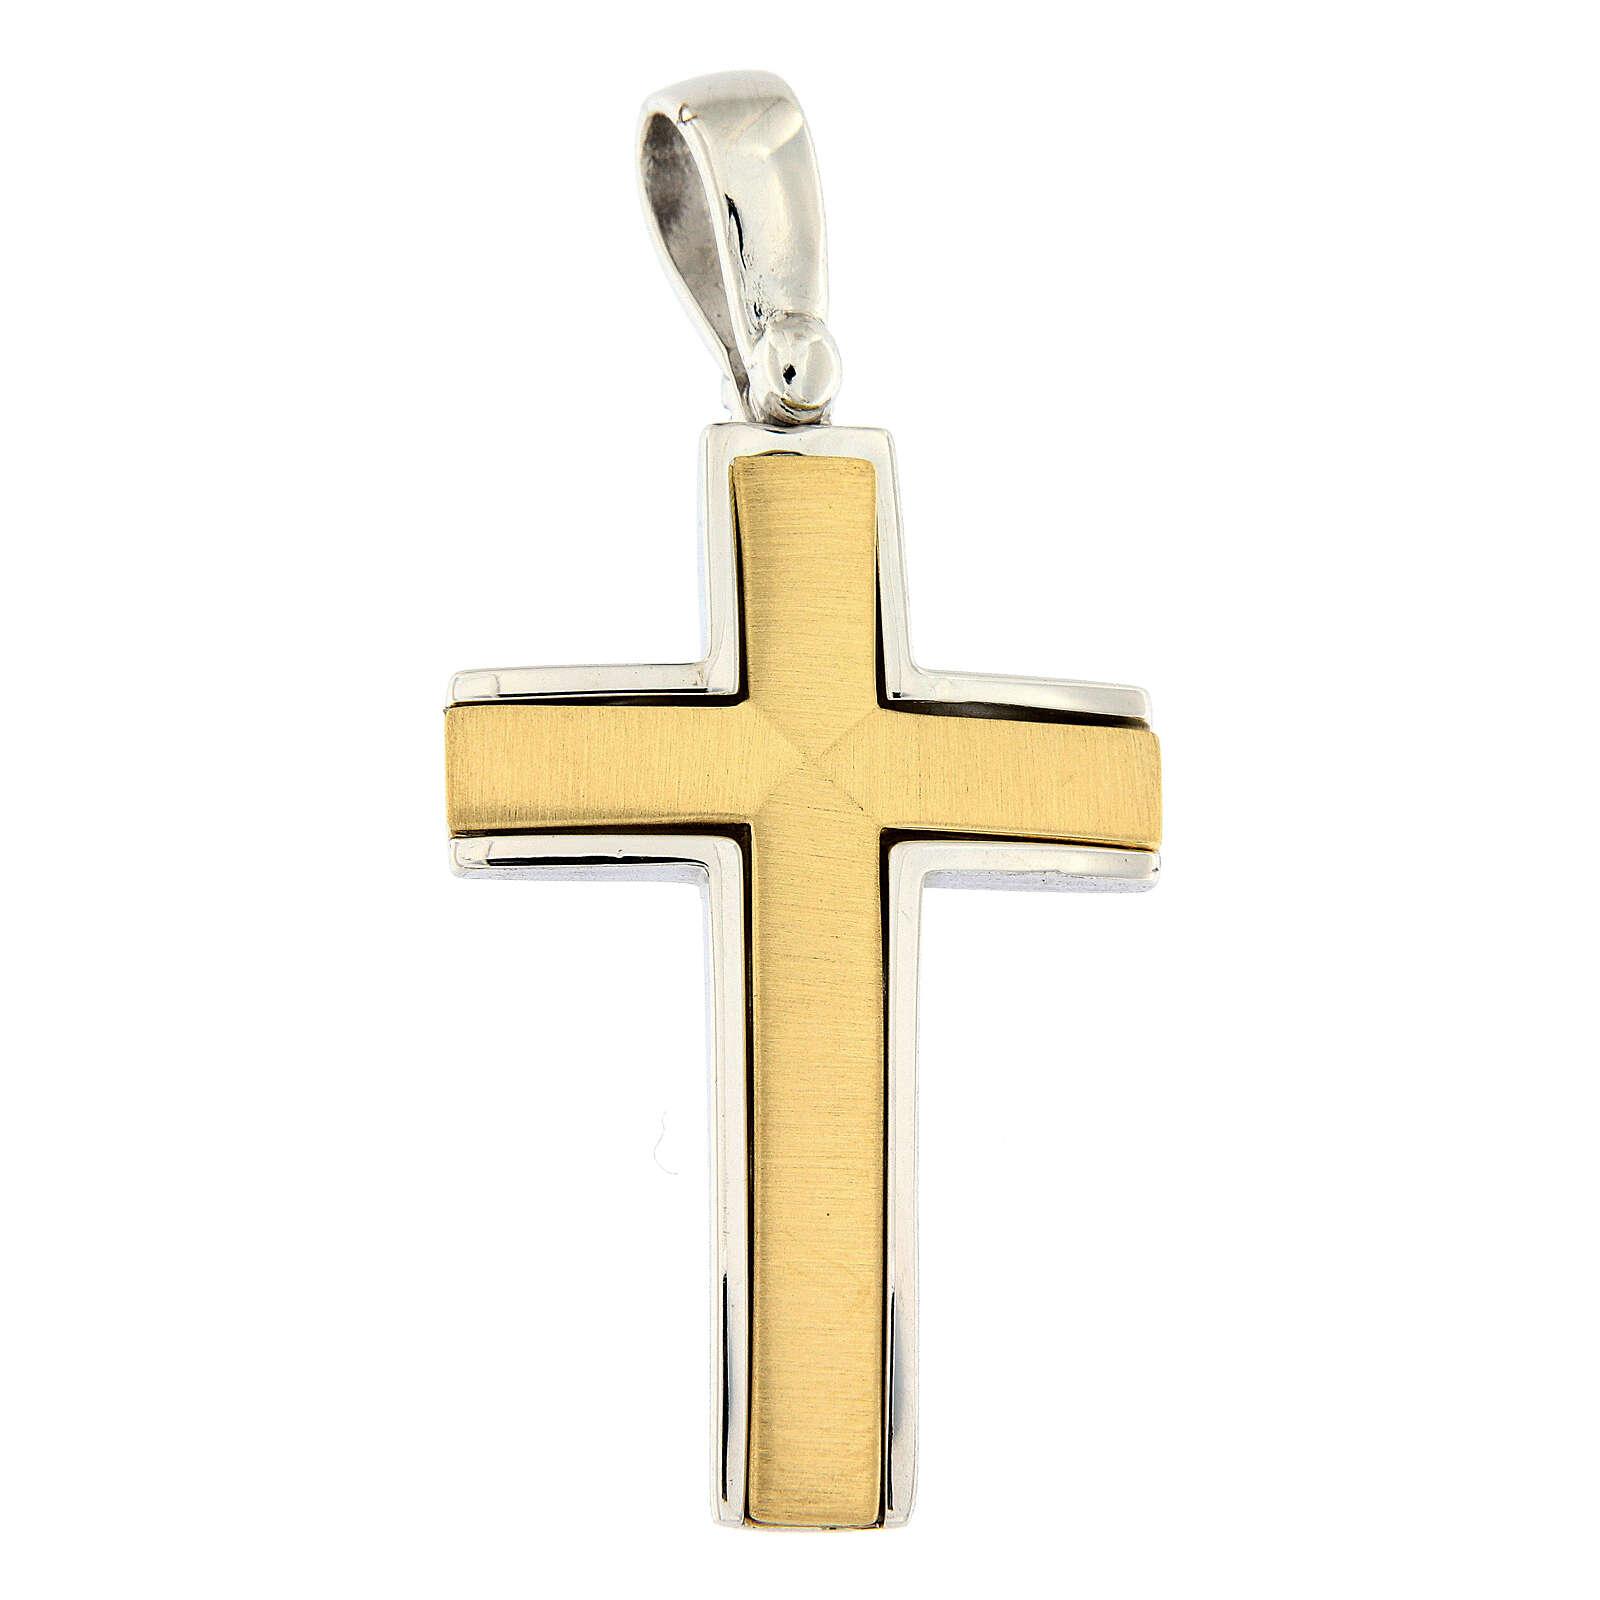 Pendente croce satinata oro 18 kt bicolore incrocio centrale 7,5 gr 4